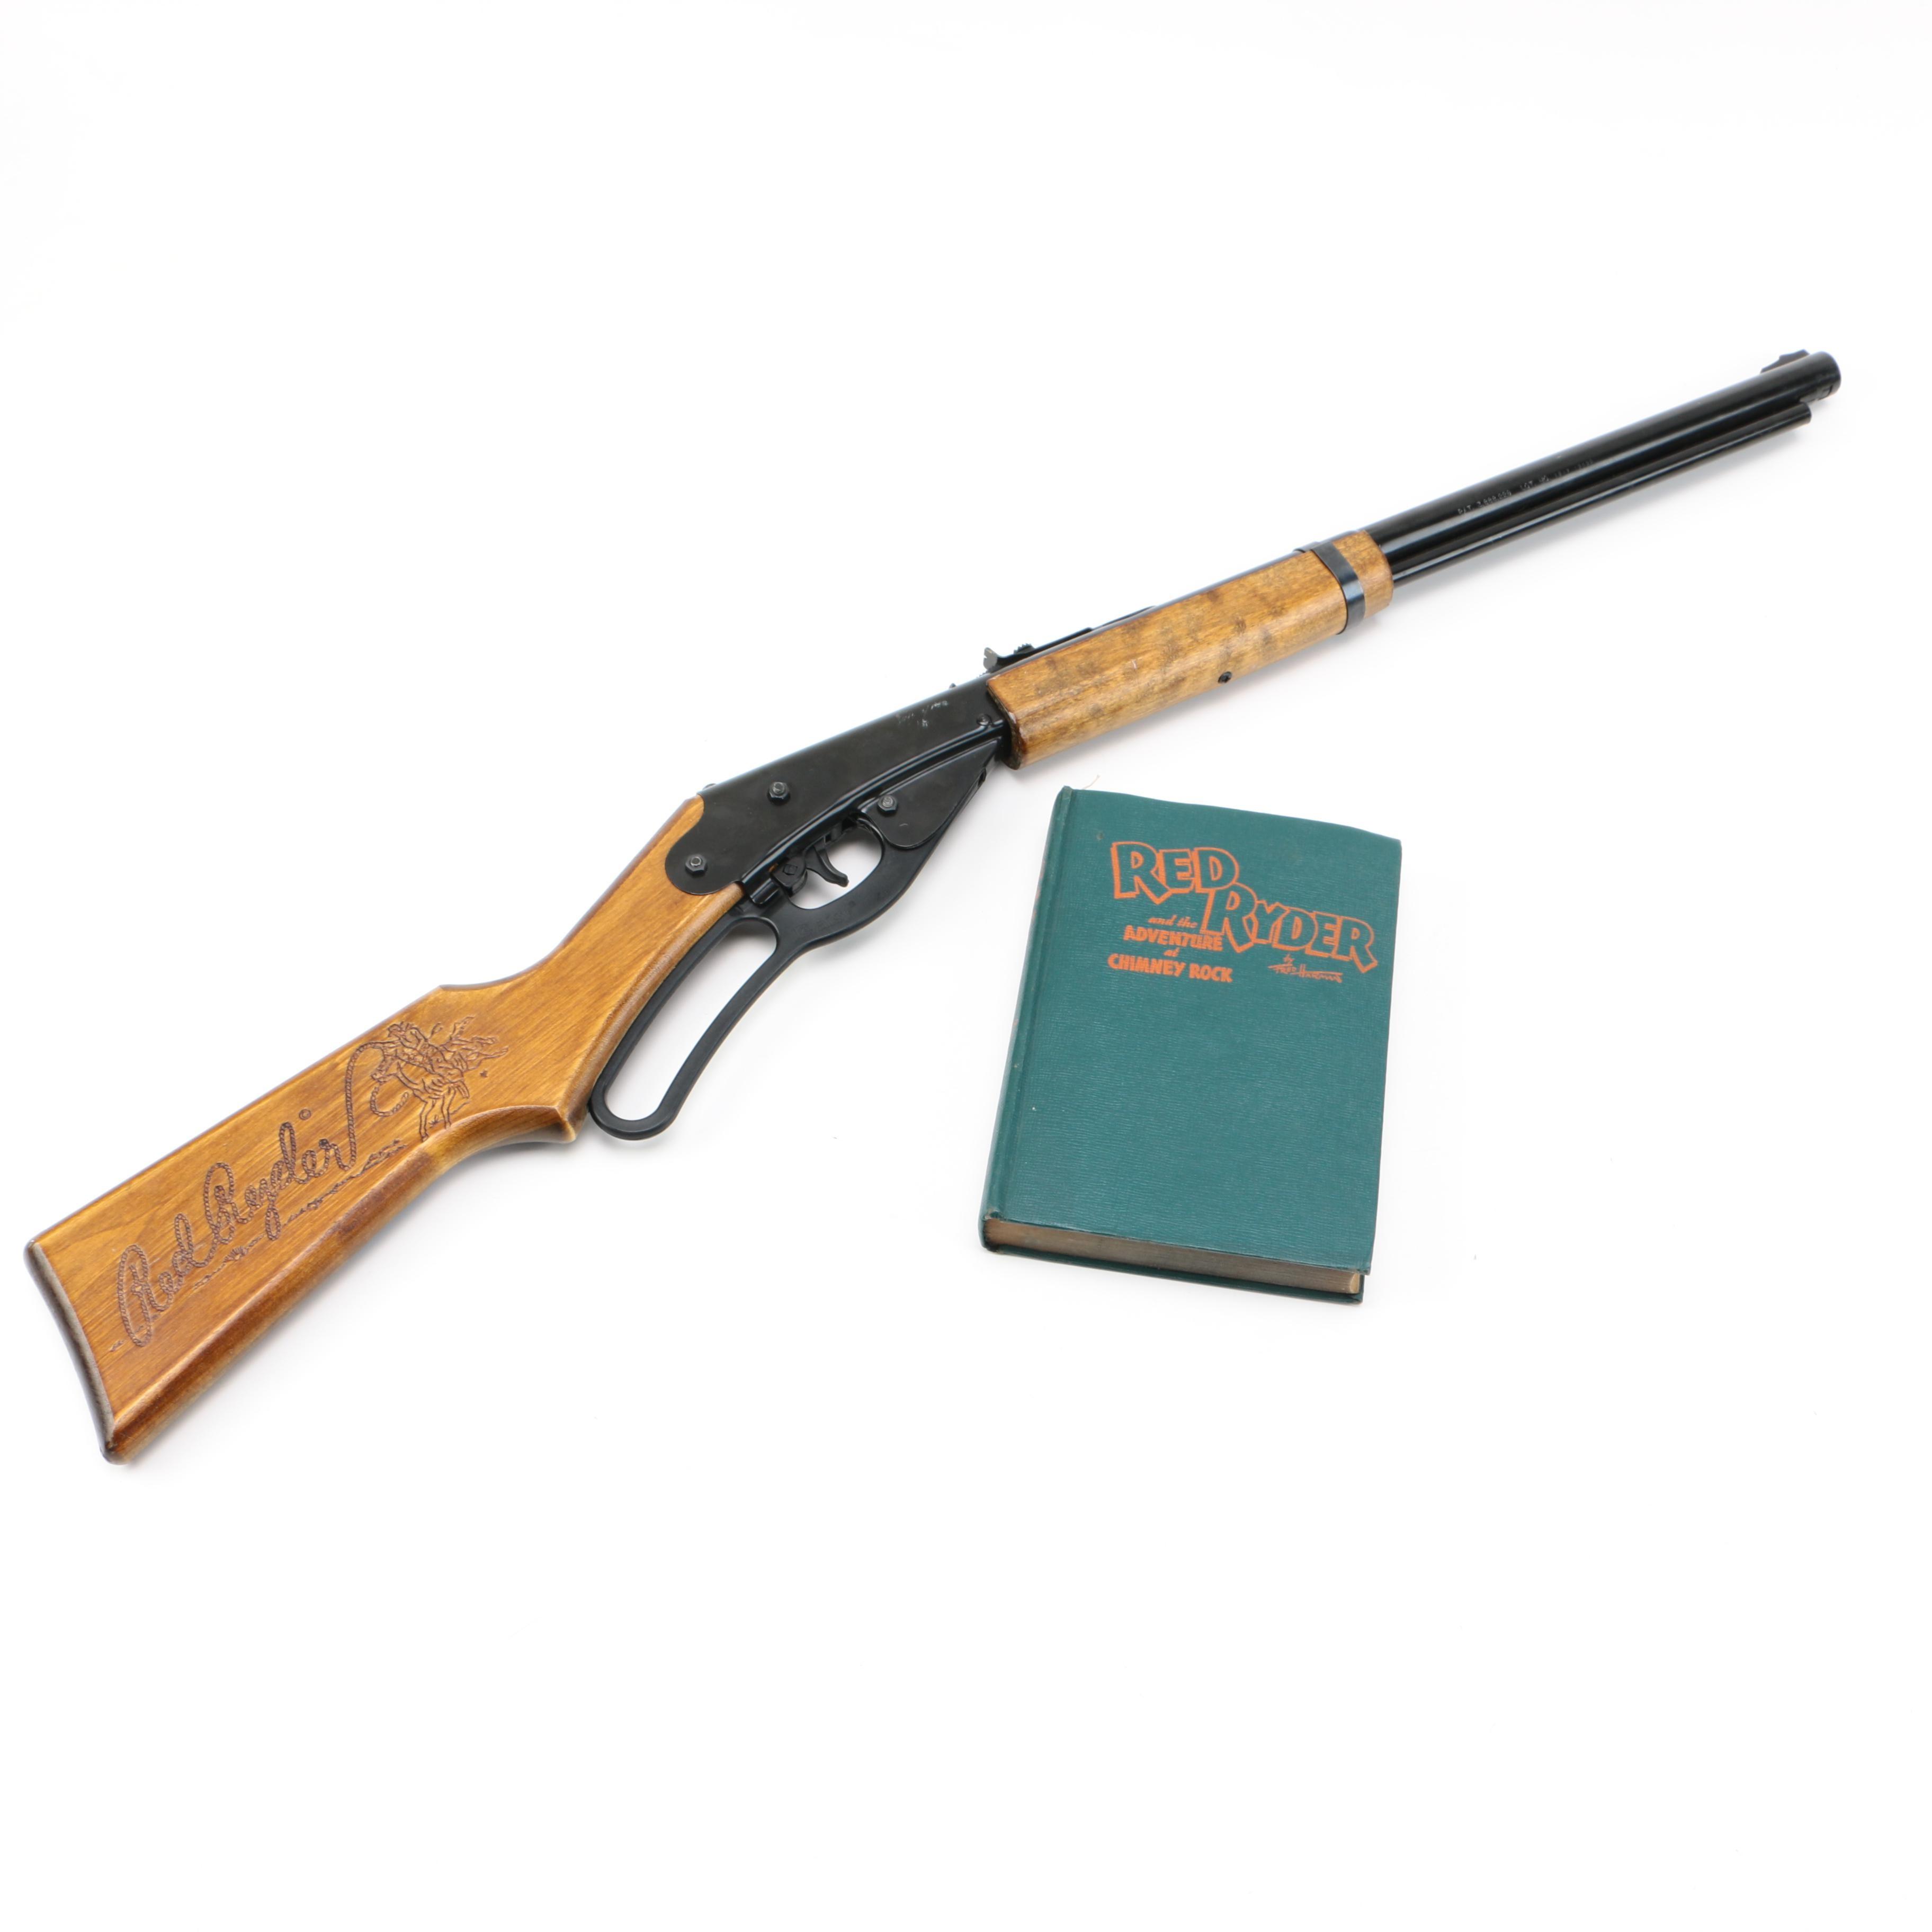 Red Ryder BB Gun and Book